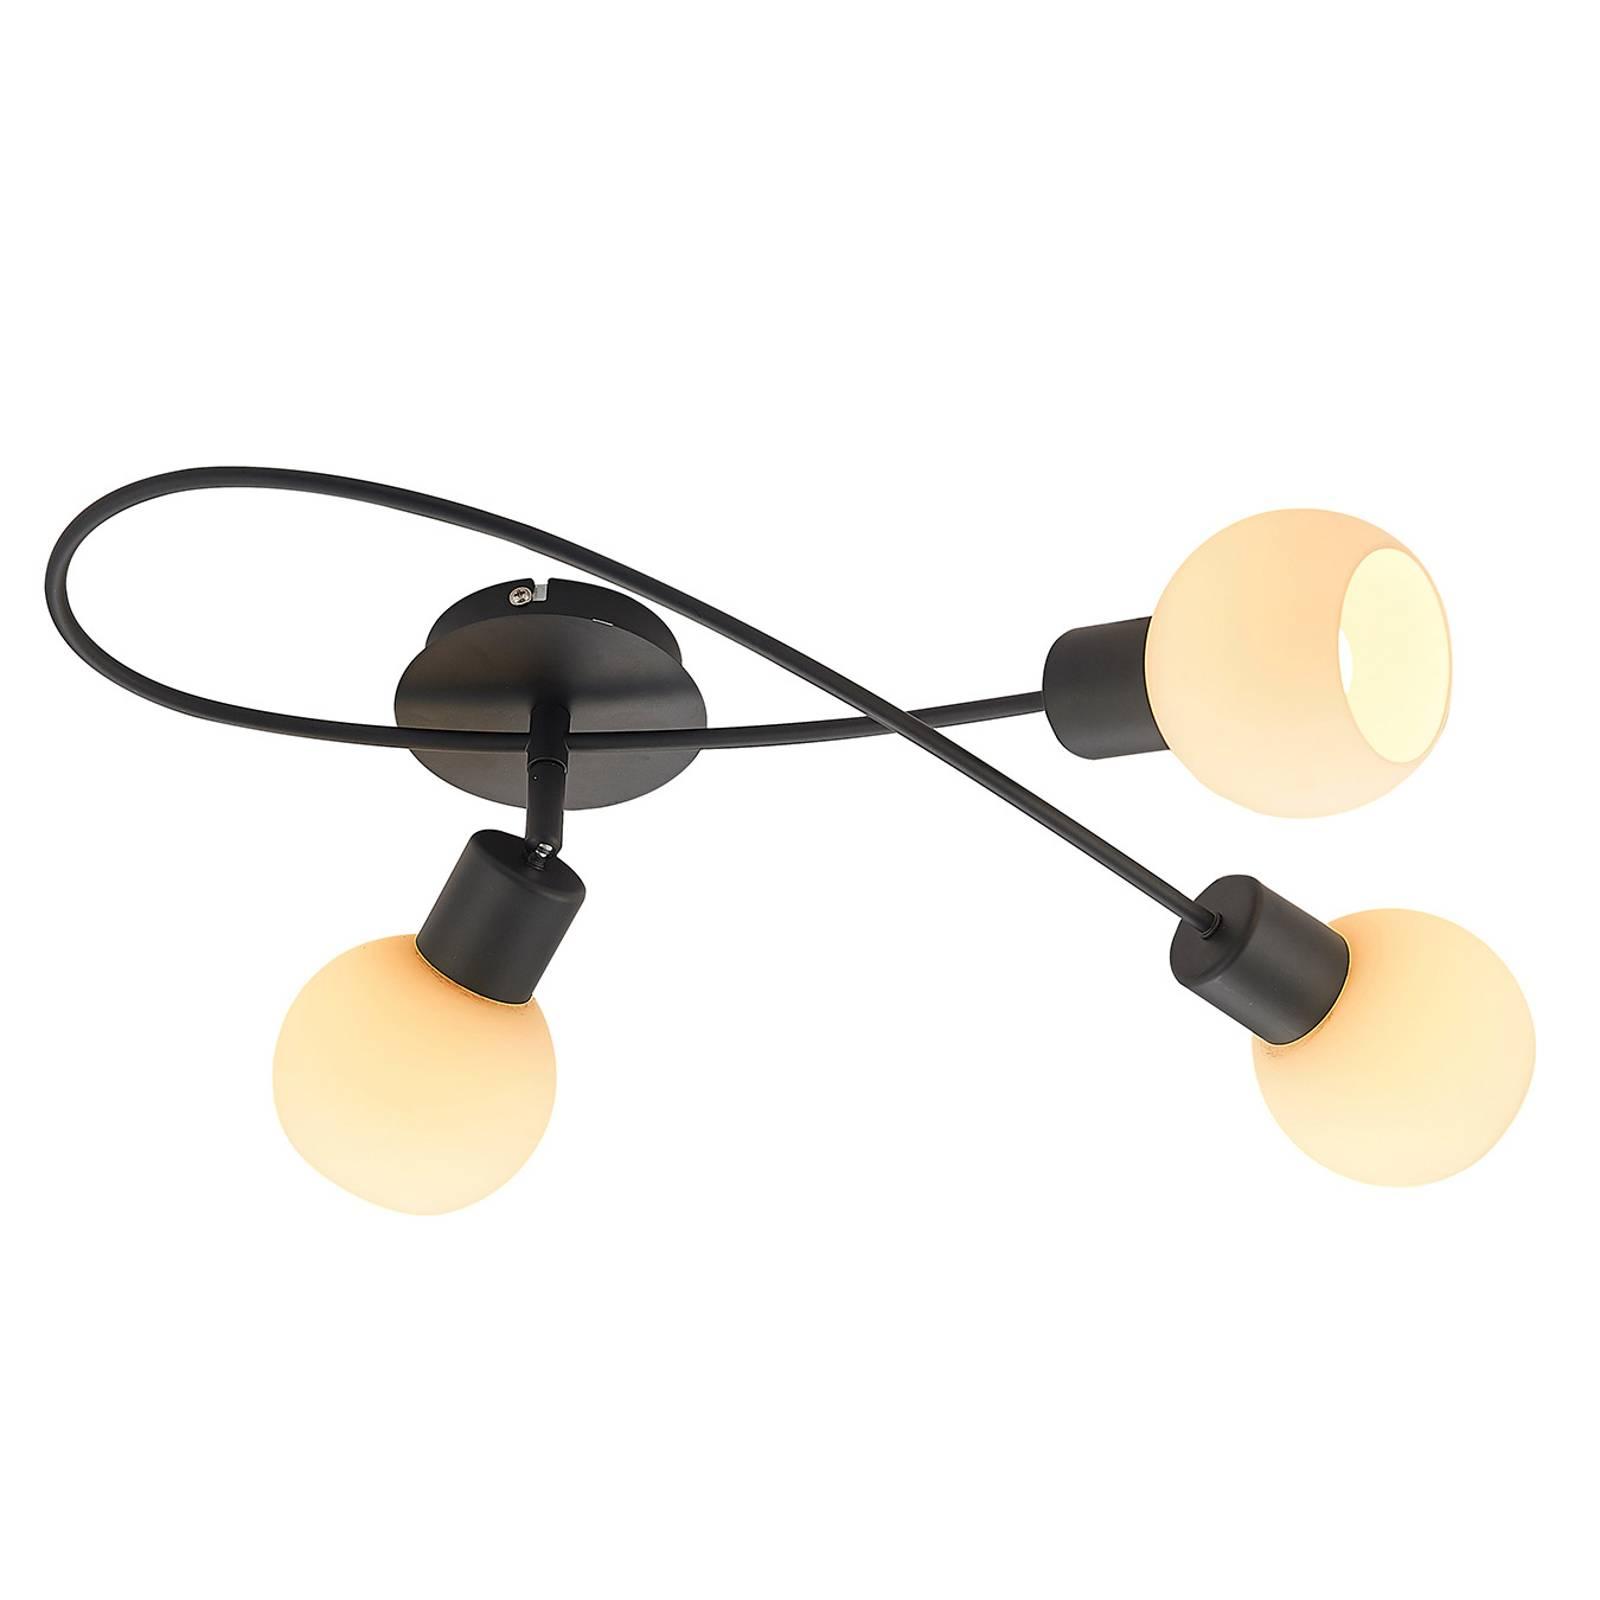 Lindby LED -kattovalaisin Elaina, 3-lamp. musta